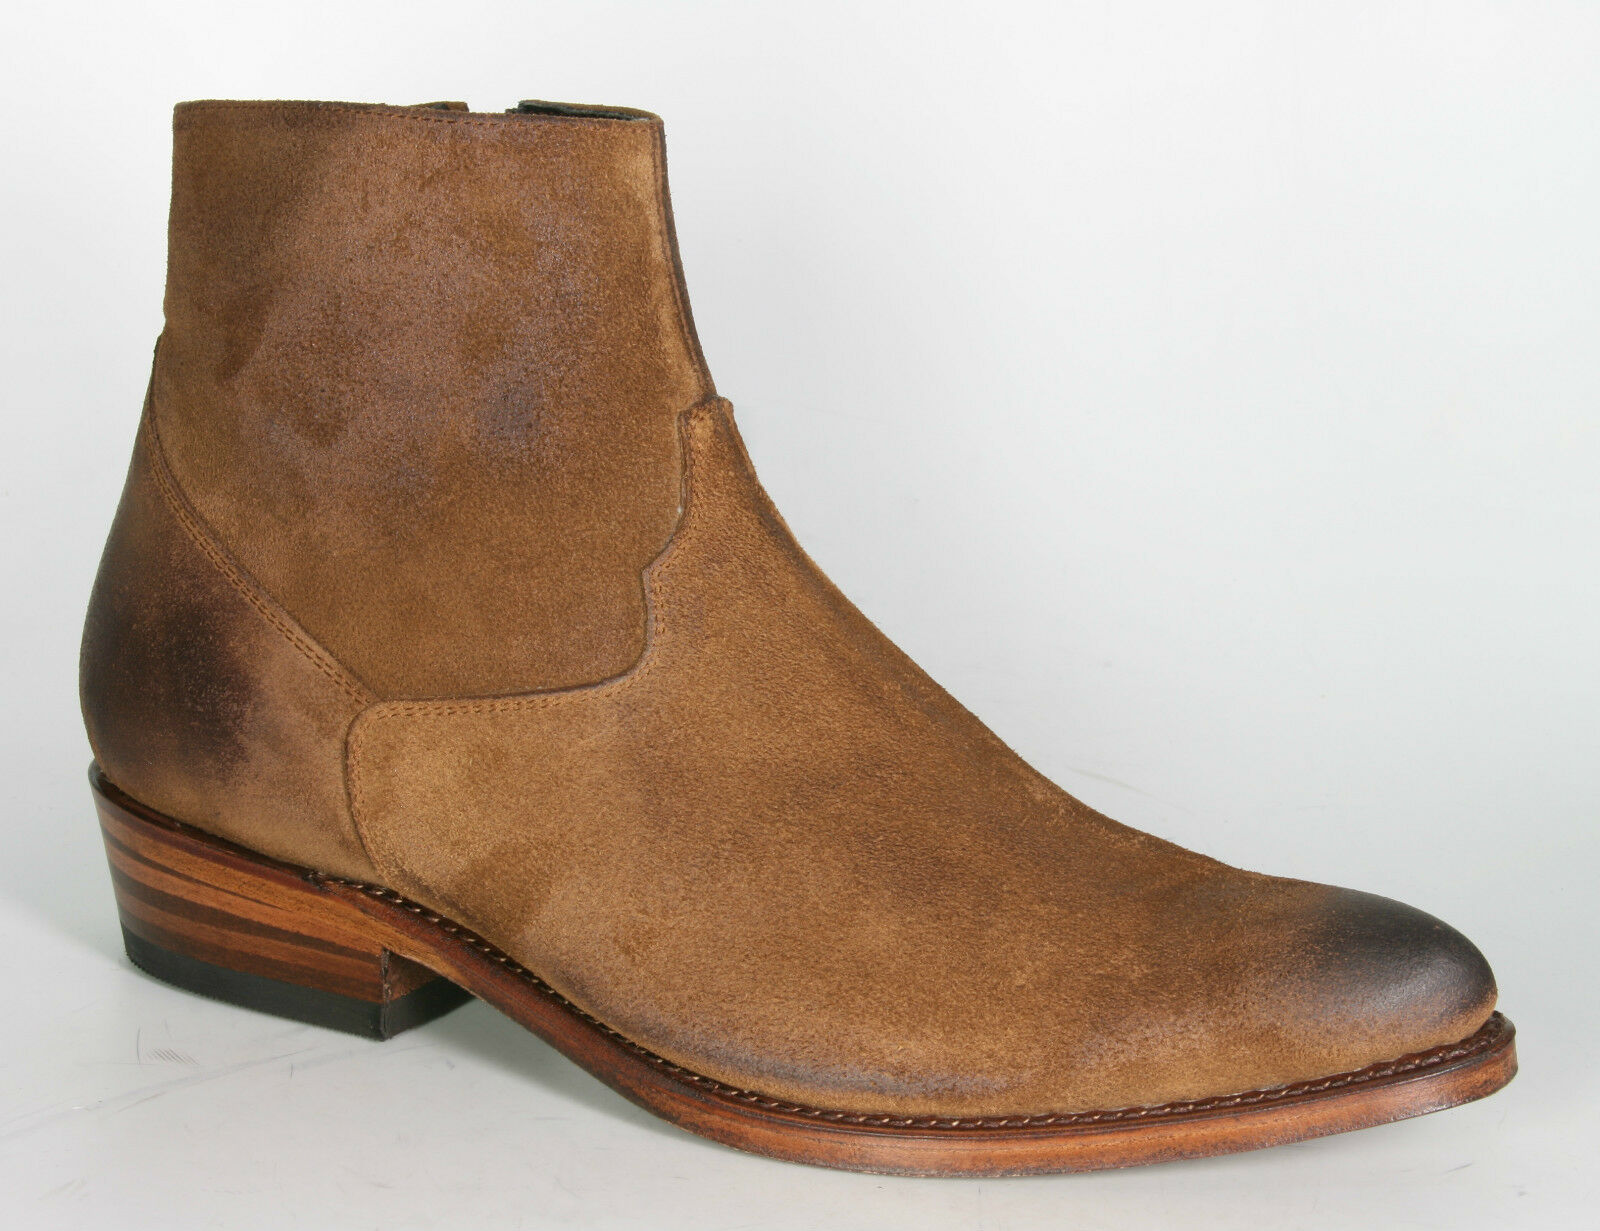 12956 sendra Bottines Lyon Daim usado cadre cousue Chaussures